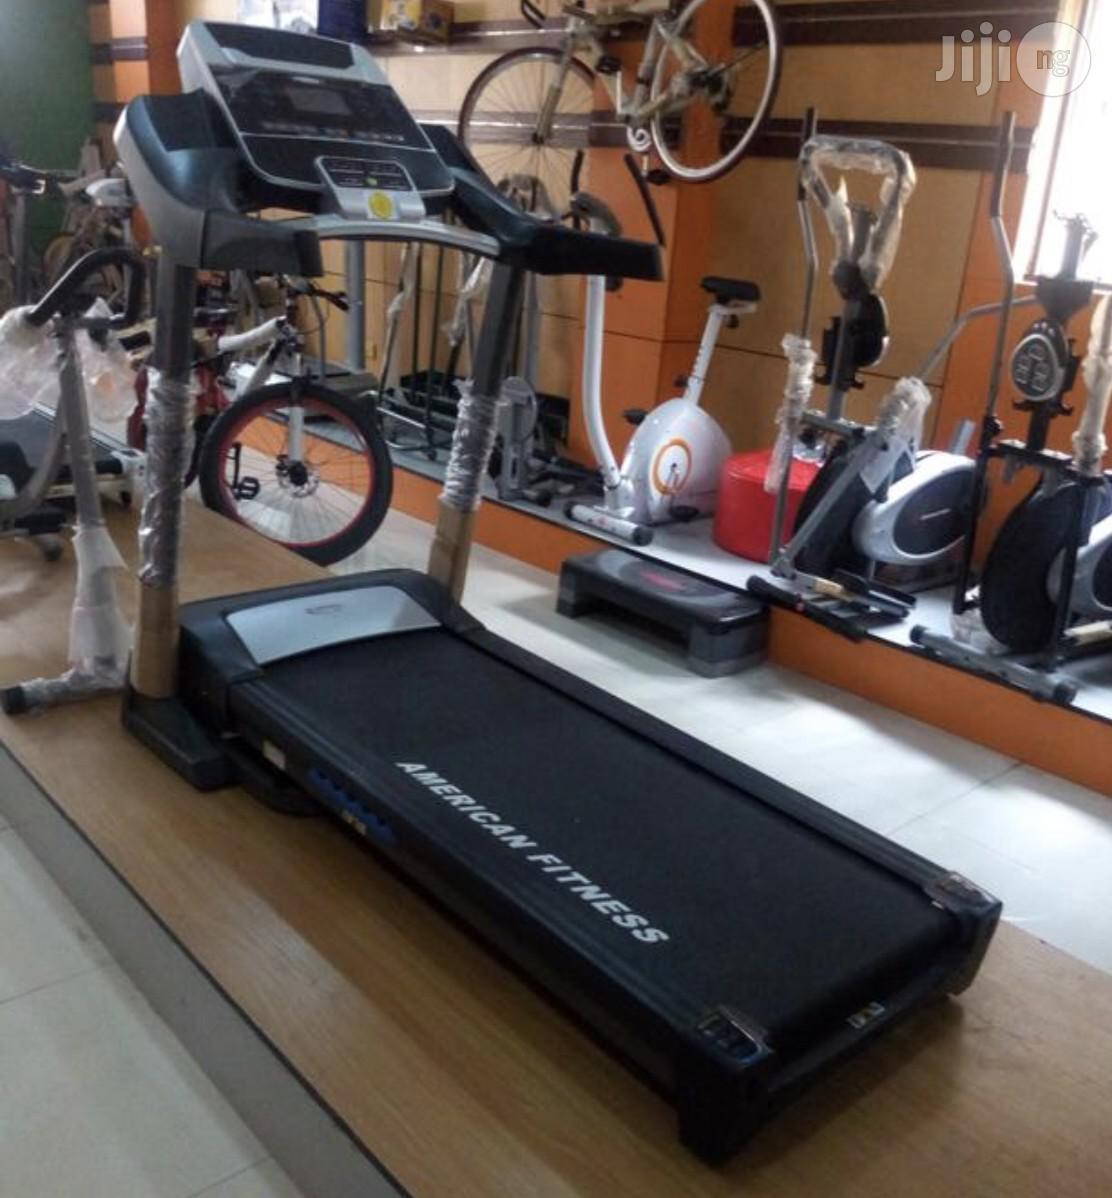 3hp Treadmill (American Fitness)